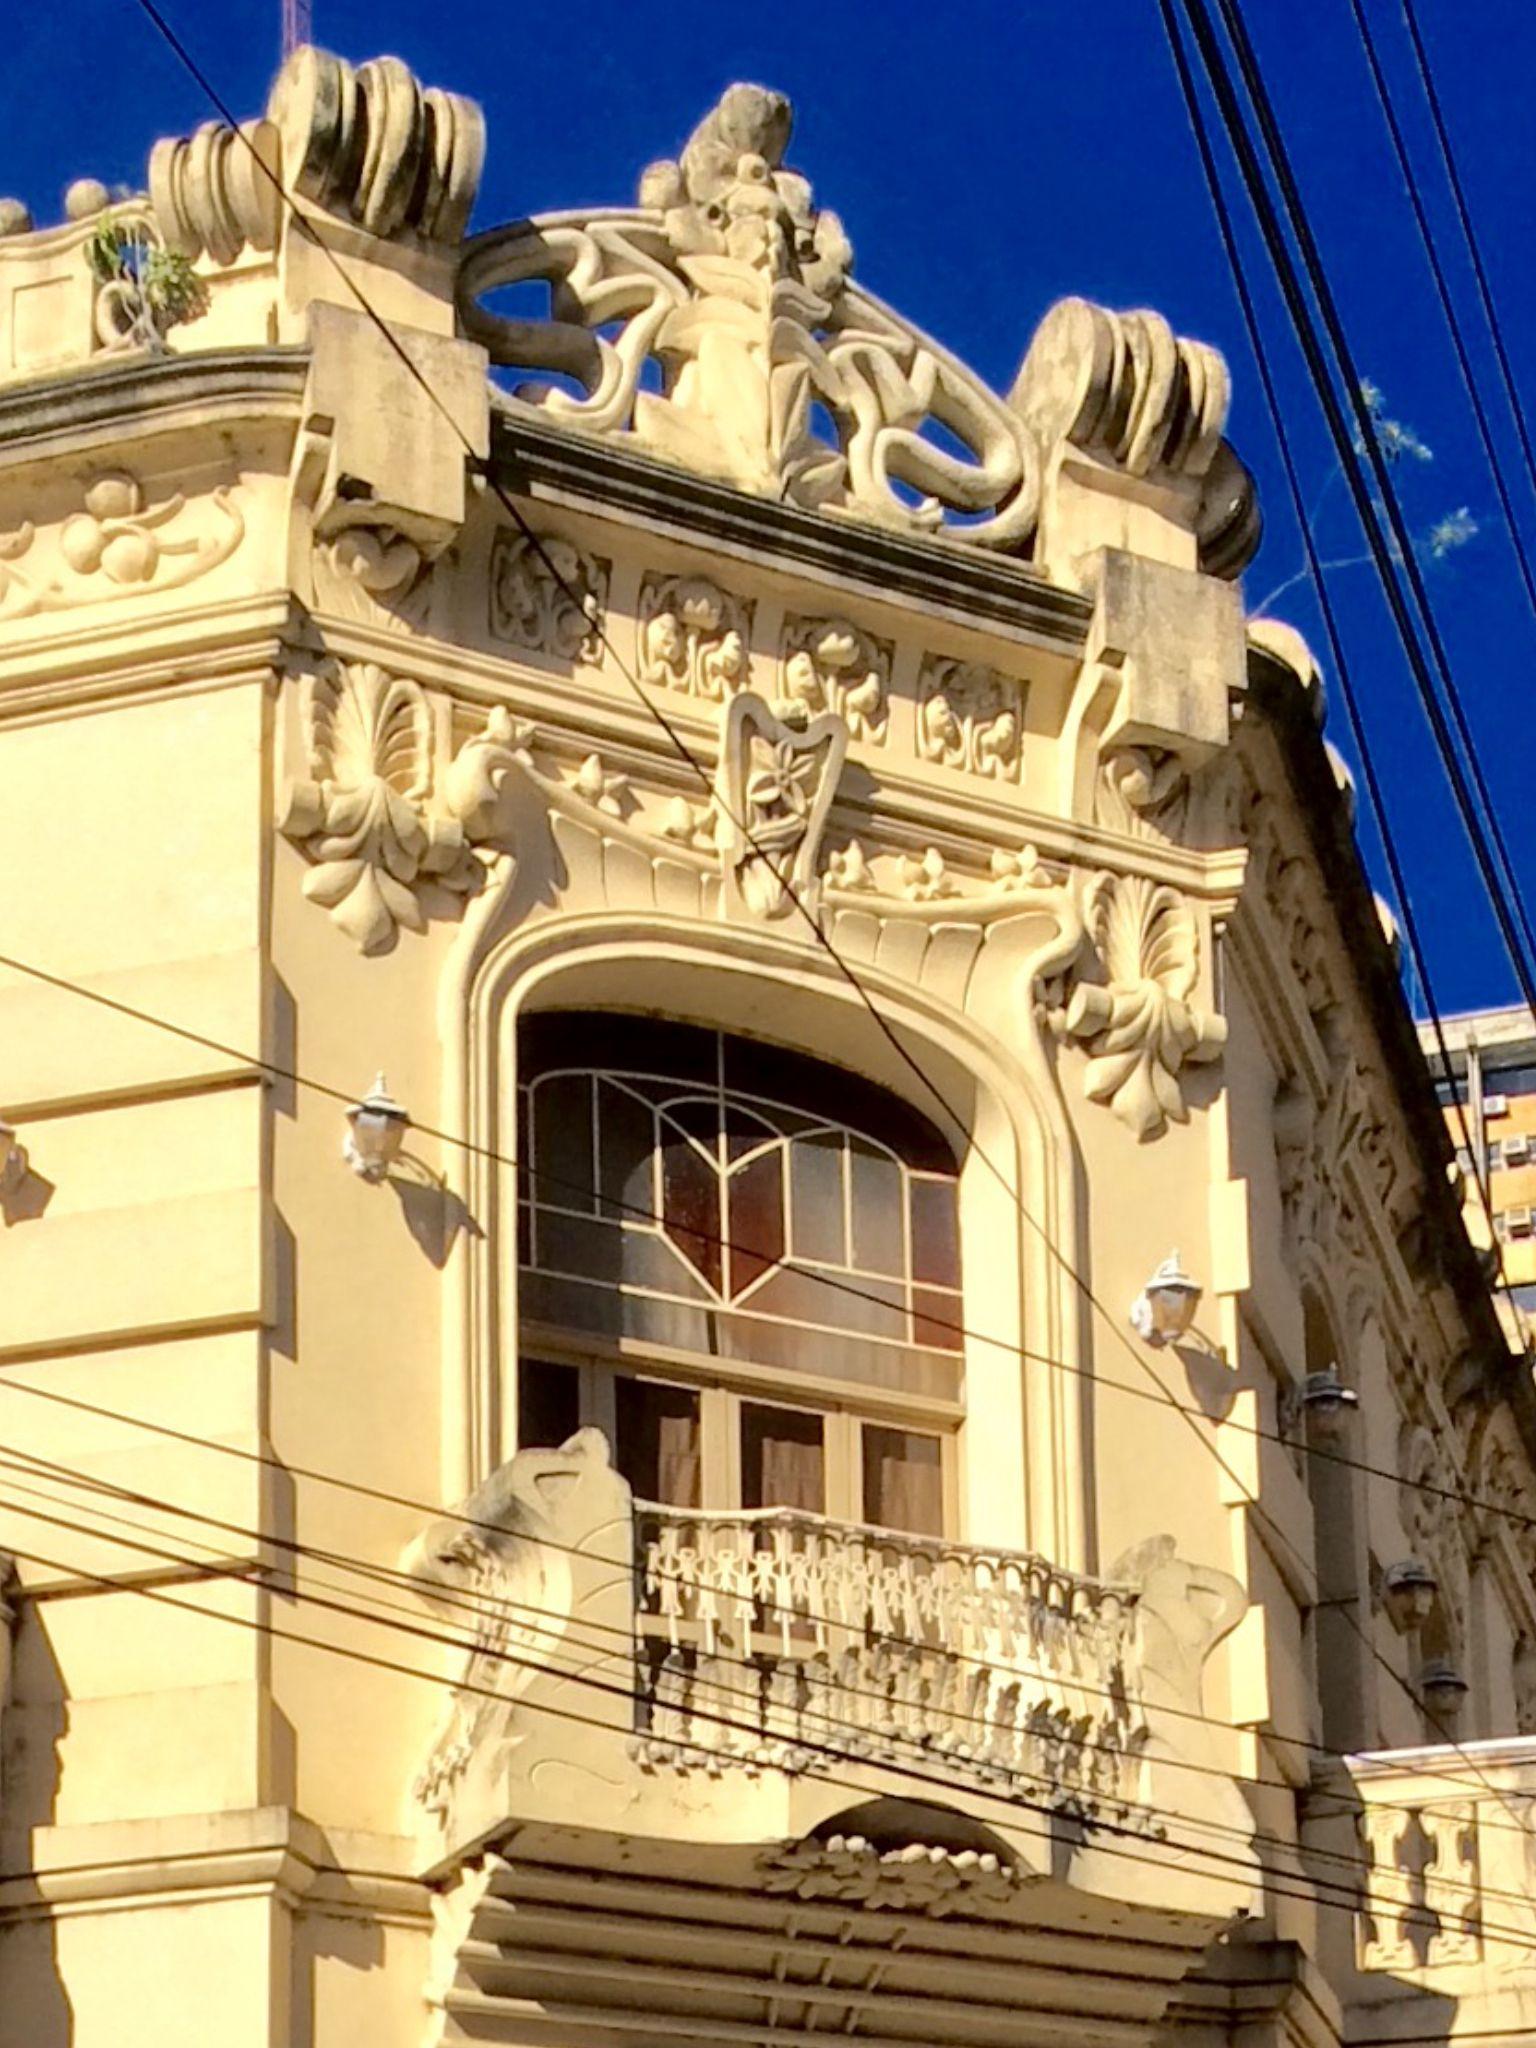 Detalle del balcón de un edificio antiguo .